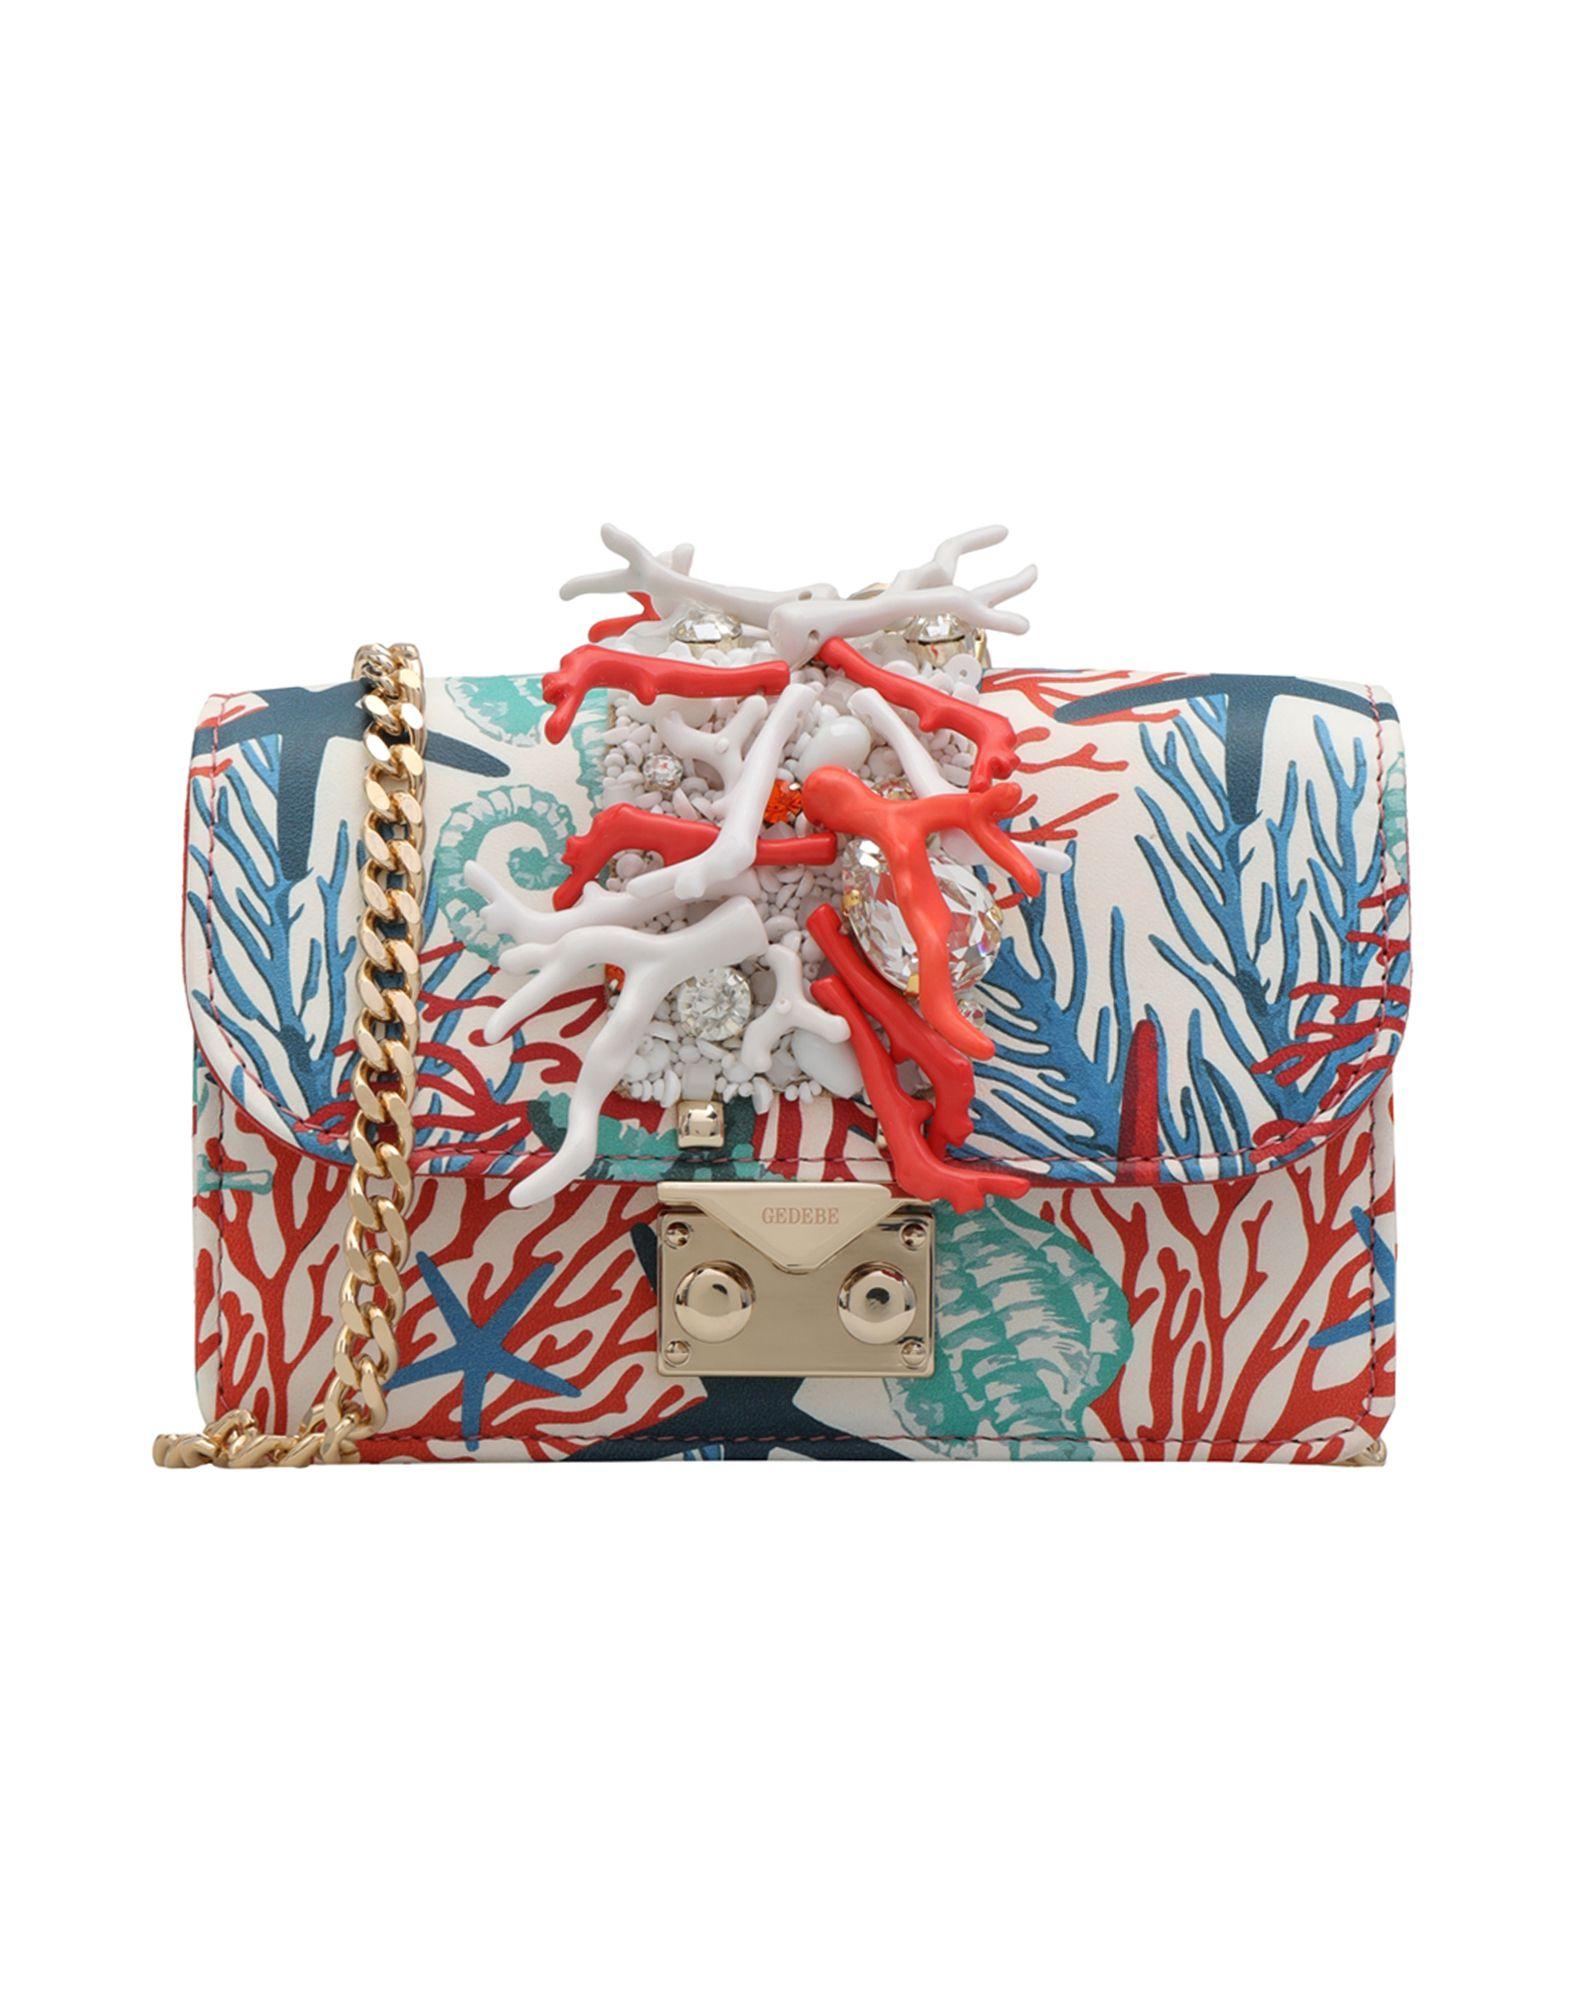 muzee парусиновая мужская сумка через плечо сумка на поясе GEDEBE Сумка через плечо